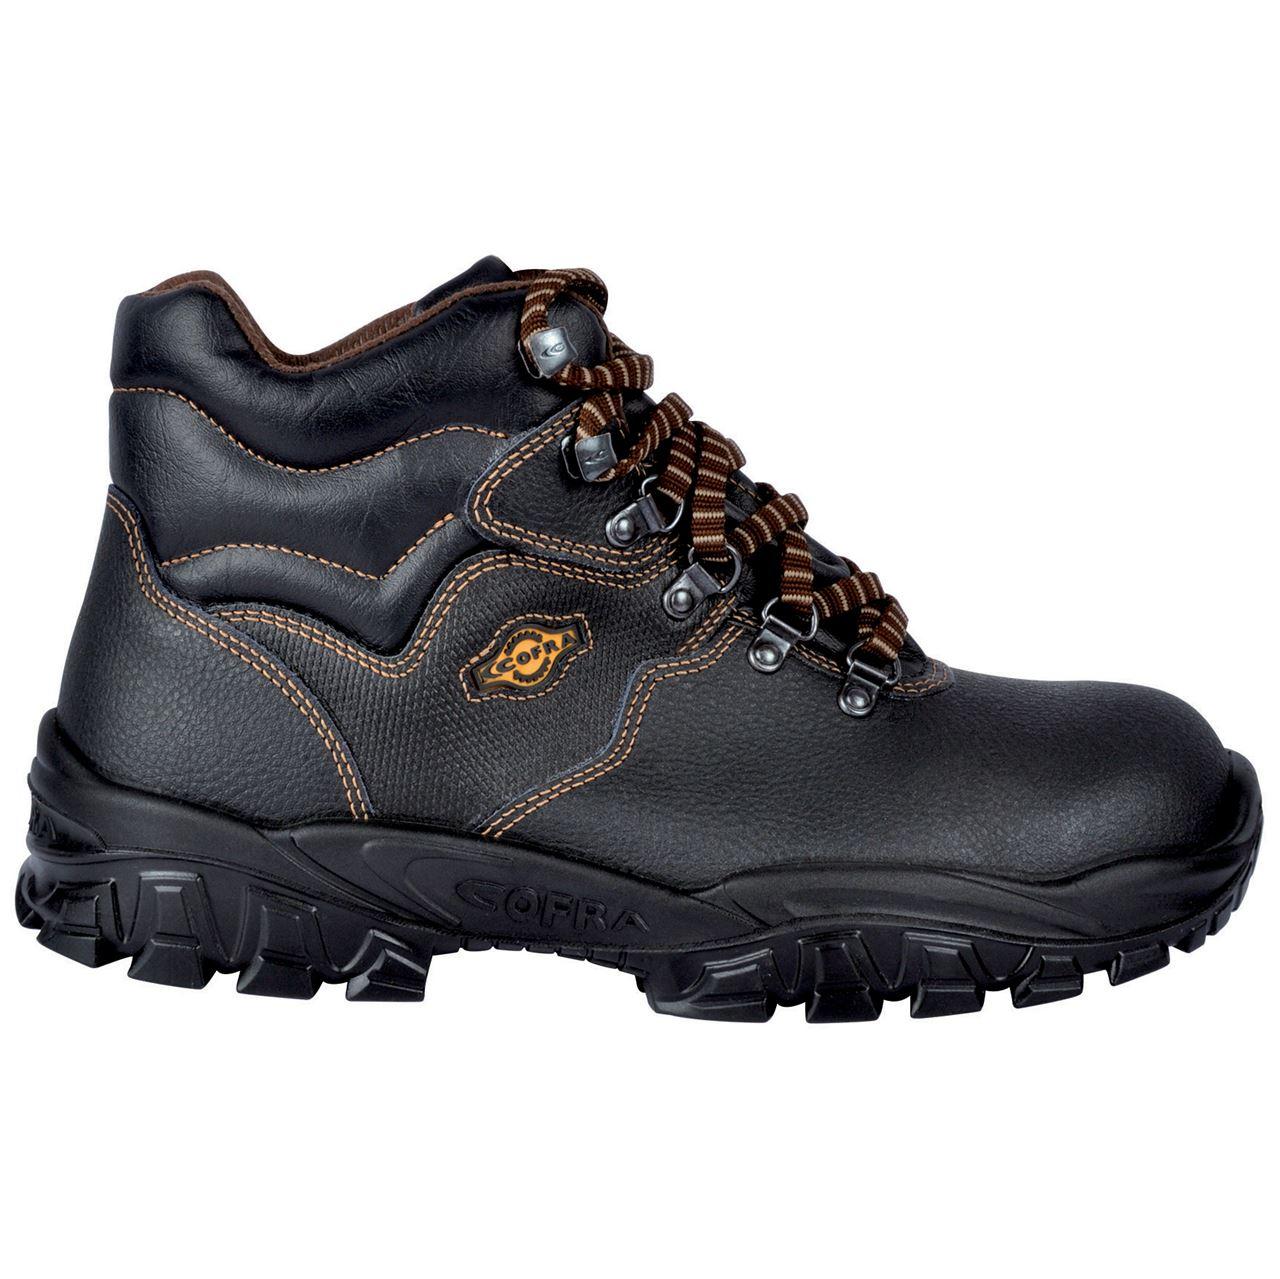 b2bb6c0fae0 Cofra Reno Unisex Antistatic Breathable Steel Toe Cap S3 Black Safety Boot